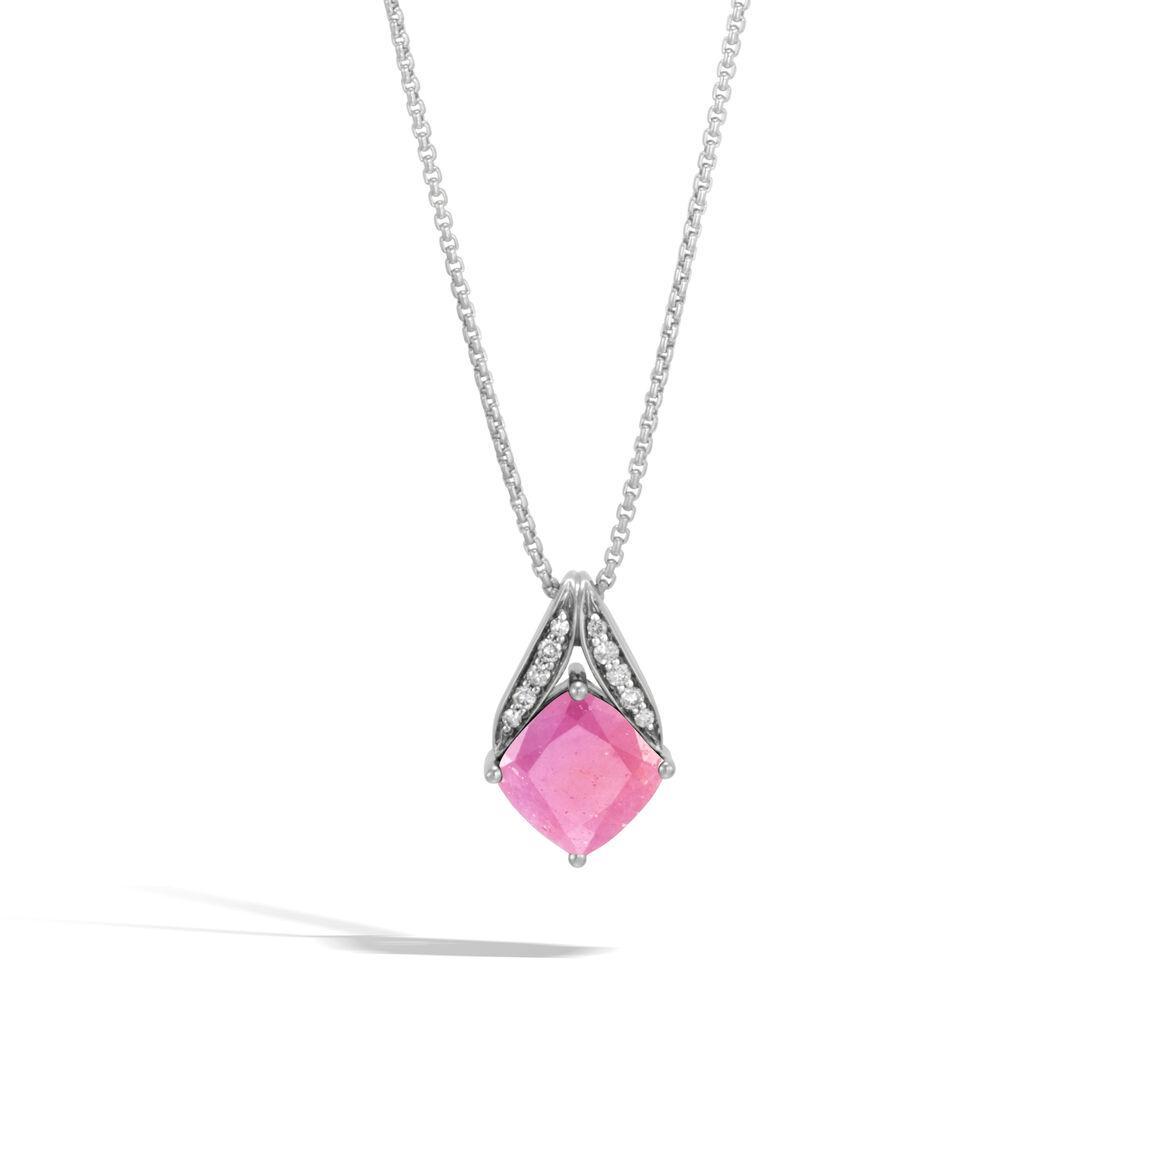 Modern Chain Magic Cut Pendant Necklace, Silver, Gems, Dia